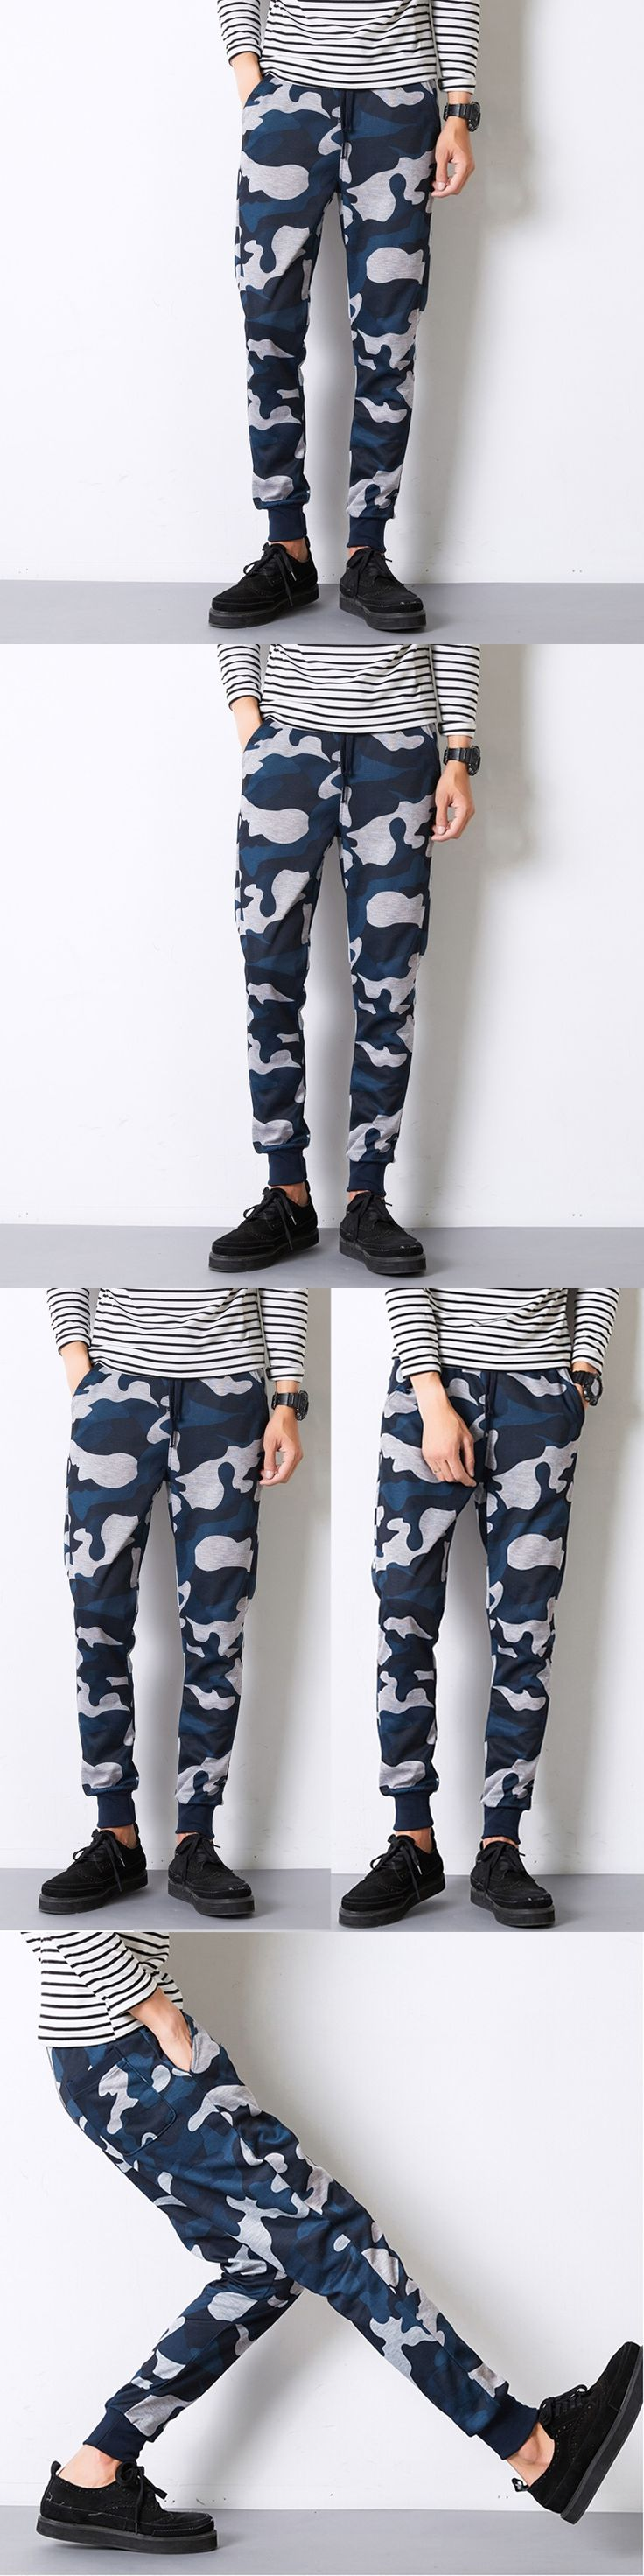 Military Camouflage Hip Hop Sweat Pants Harem Dance Jogger Baggy Trousers Autumn Army Men Pants Man Trousers Joggers